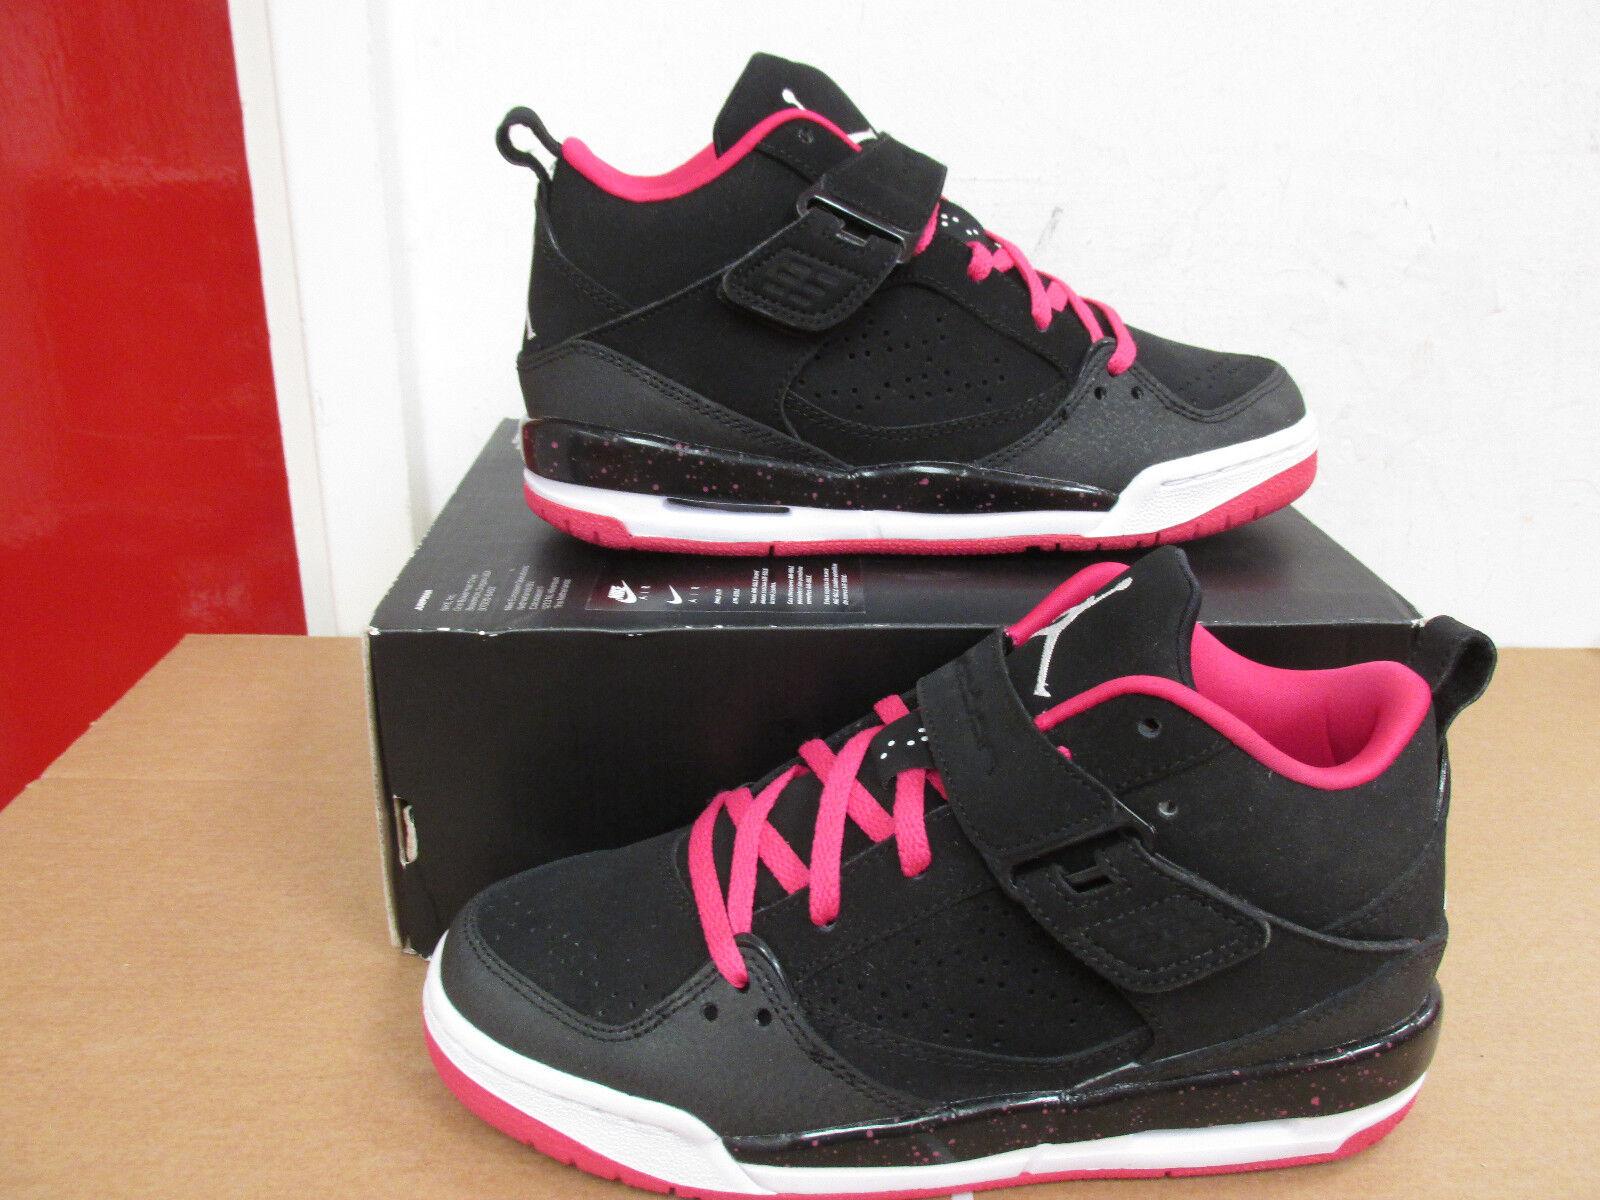 Nike Air Jordan Flight Trainers 45 GG Hi Top Trainers Flight 644874 009 Chaussures Baskets CLEARANCE 91fd4c